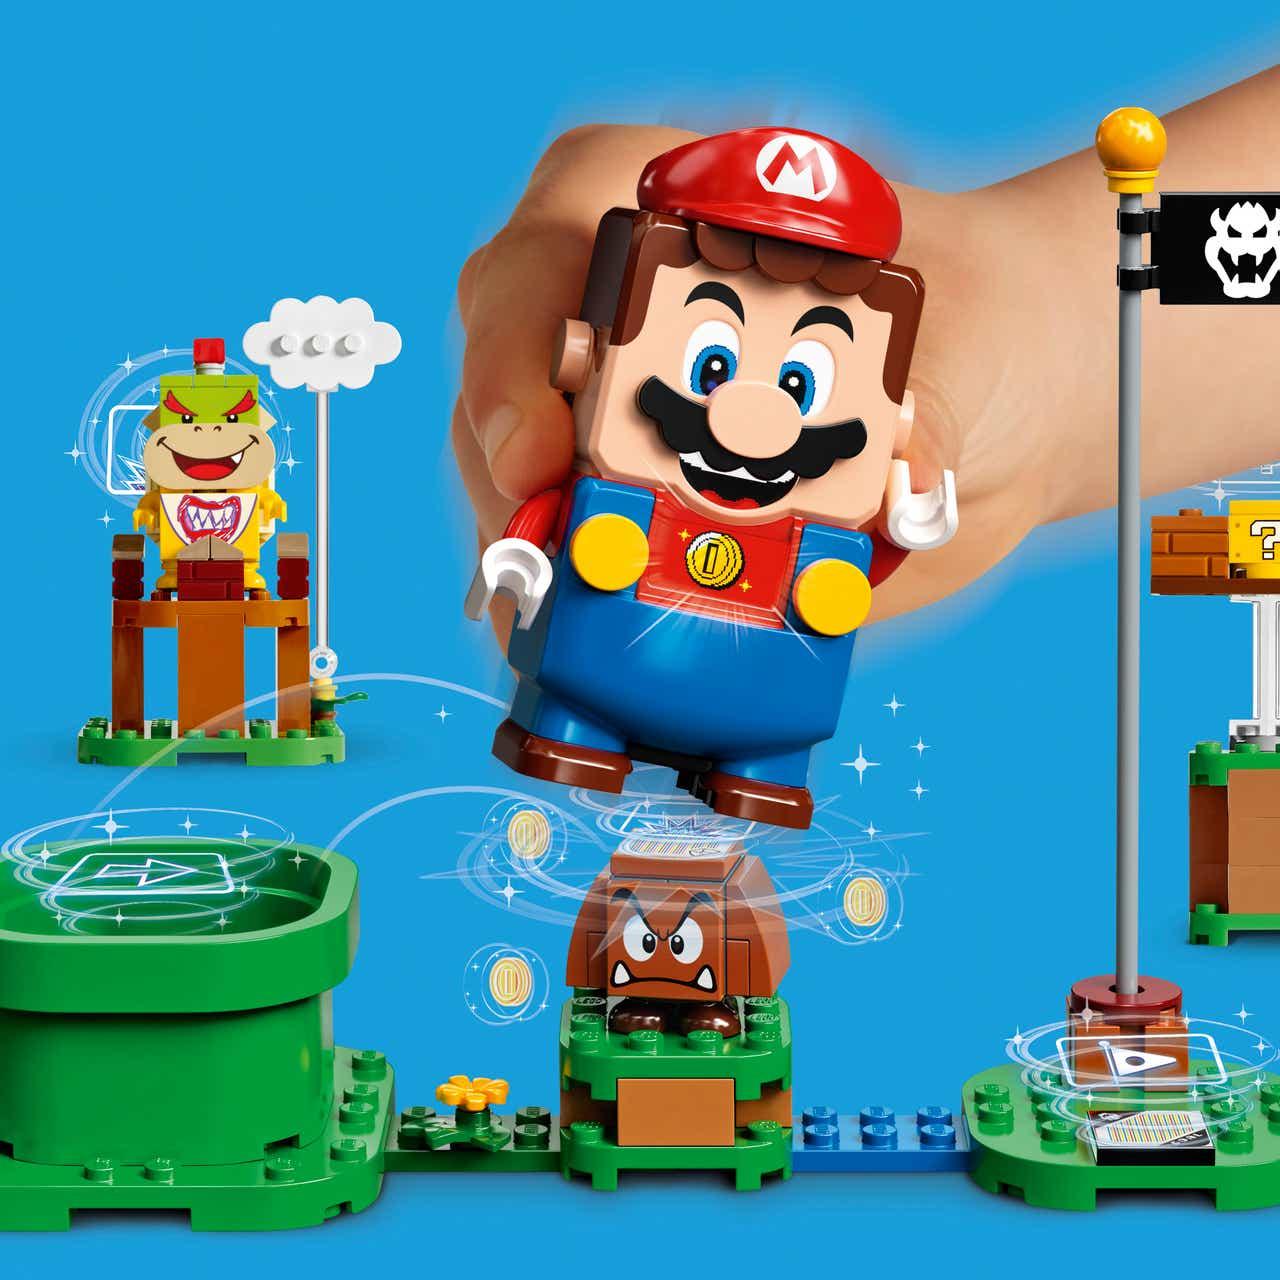 Nintendo and LEGO officially reveal Mario sets